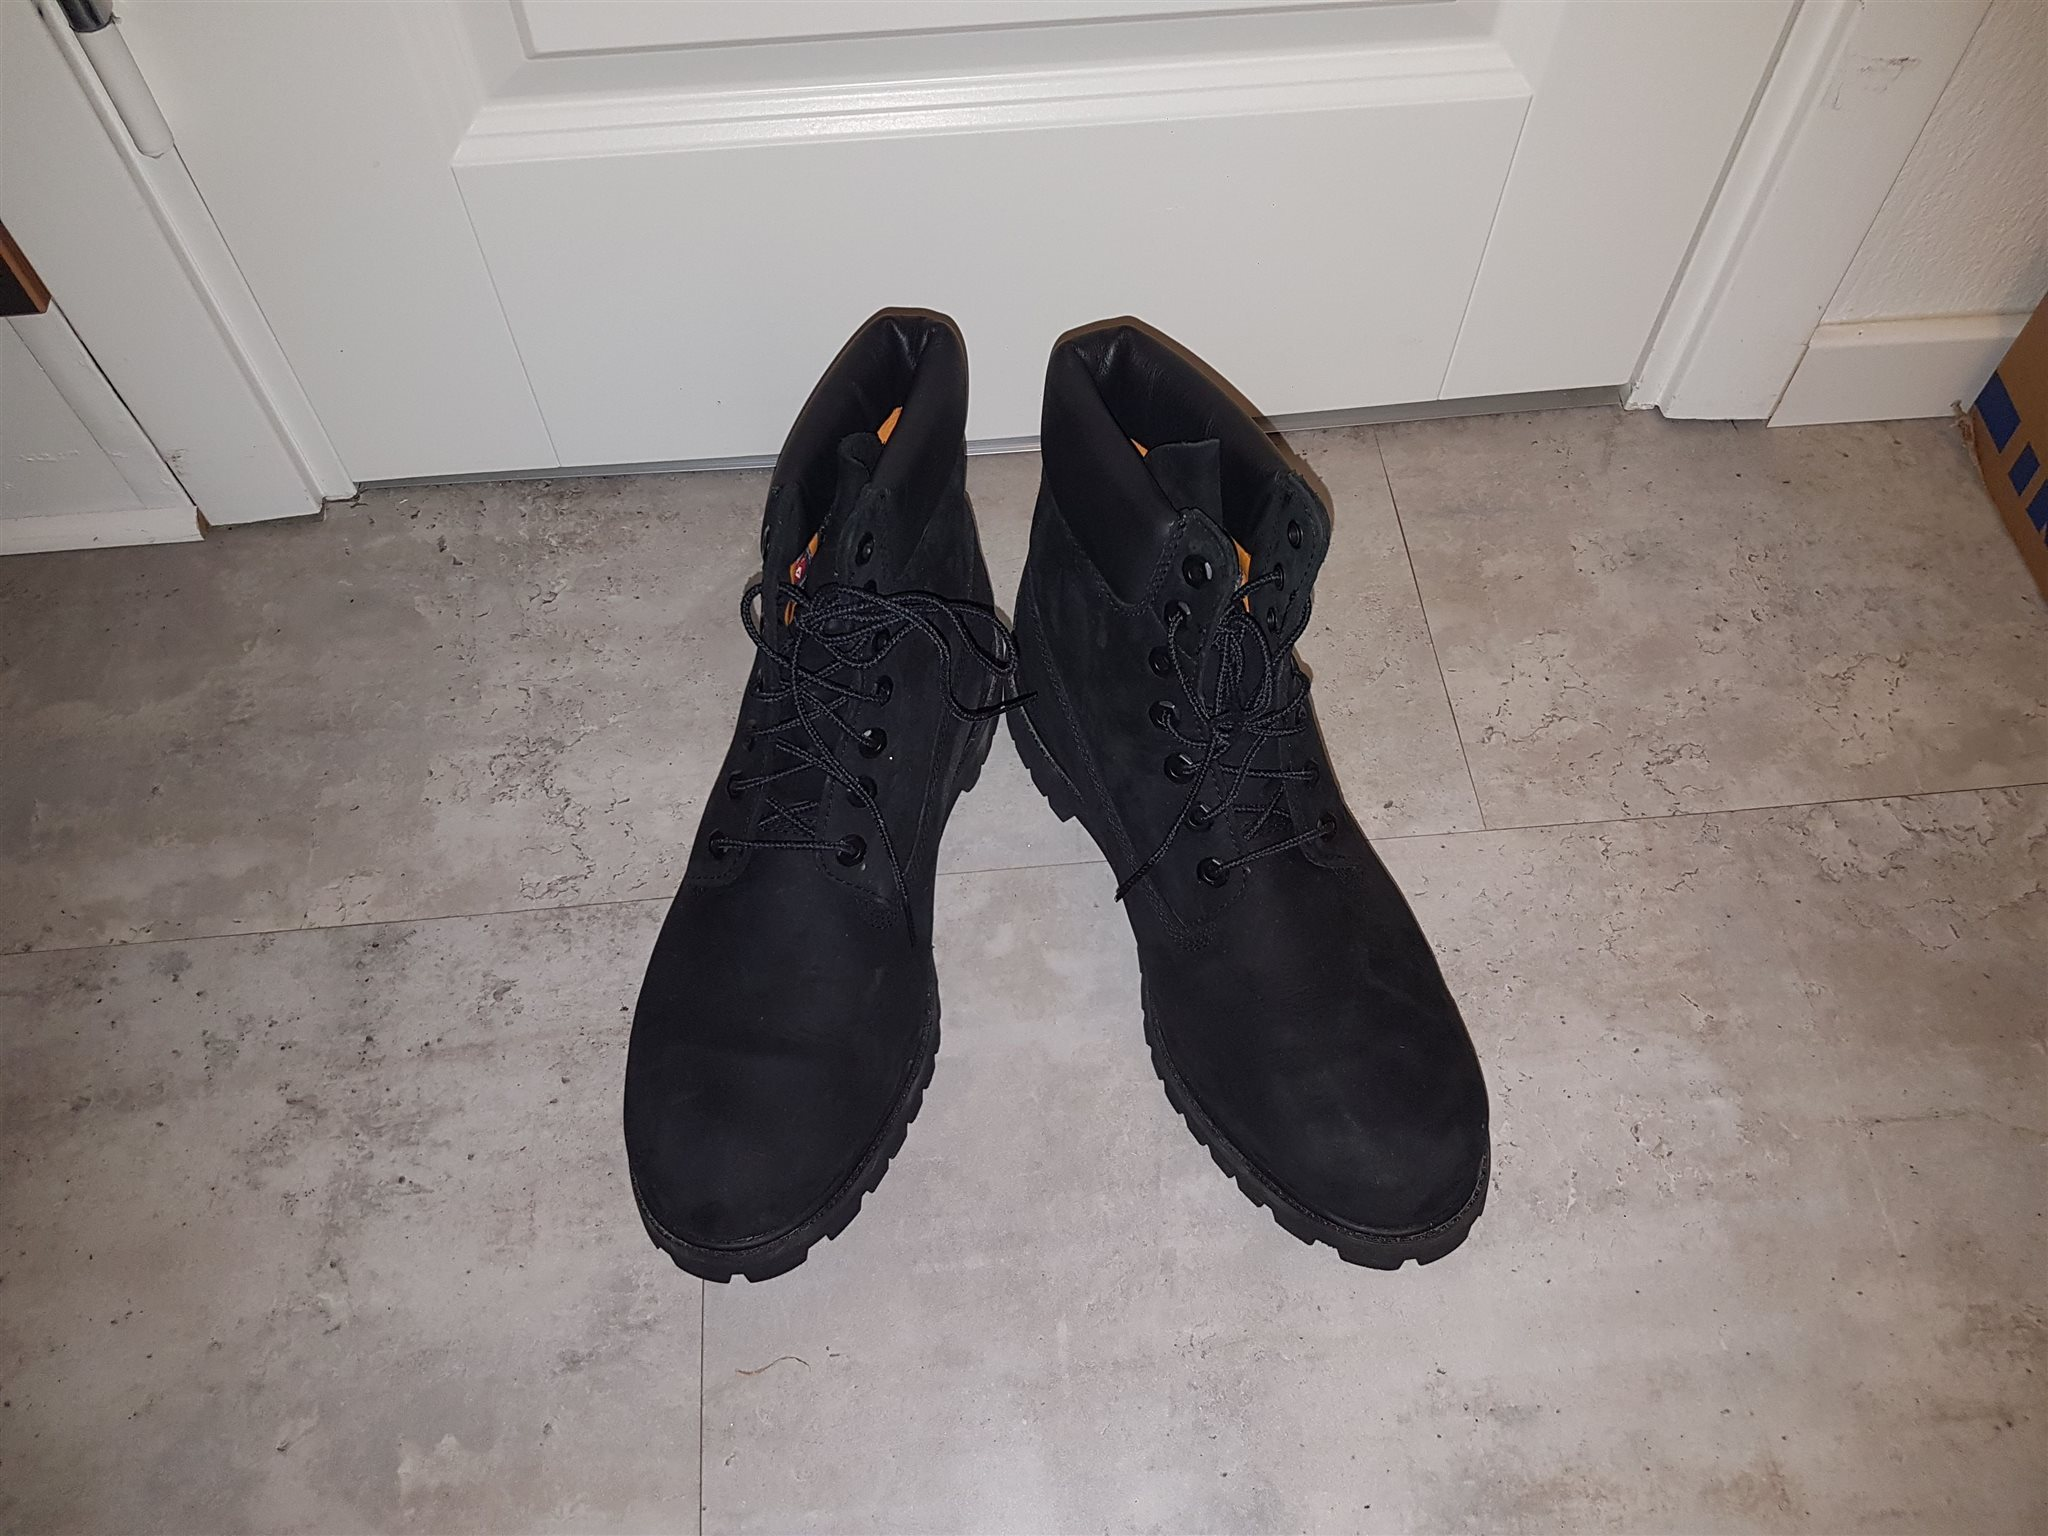 fae44c4da77 Snygga Timberland Kängor boots skor herr stl 45 (342739262) ᐈ Köp ...